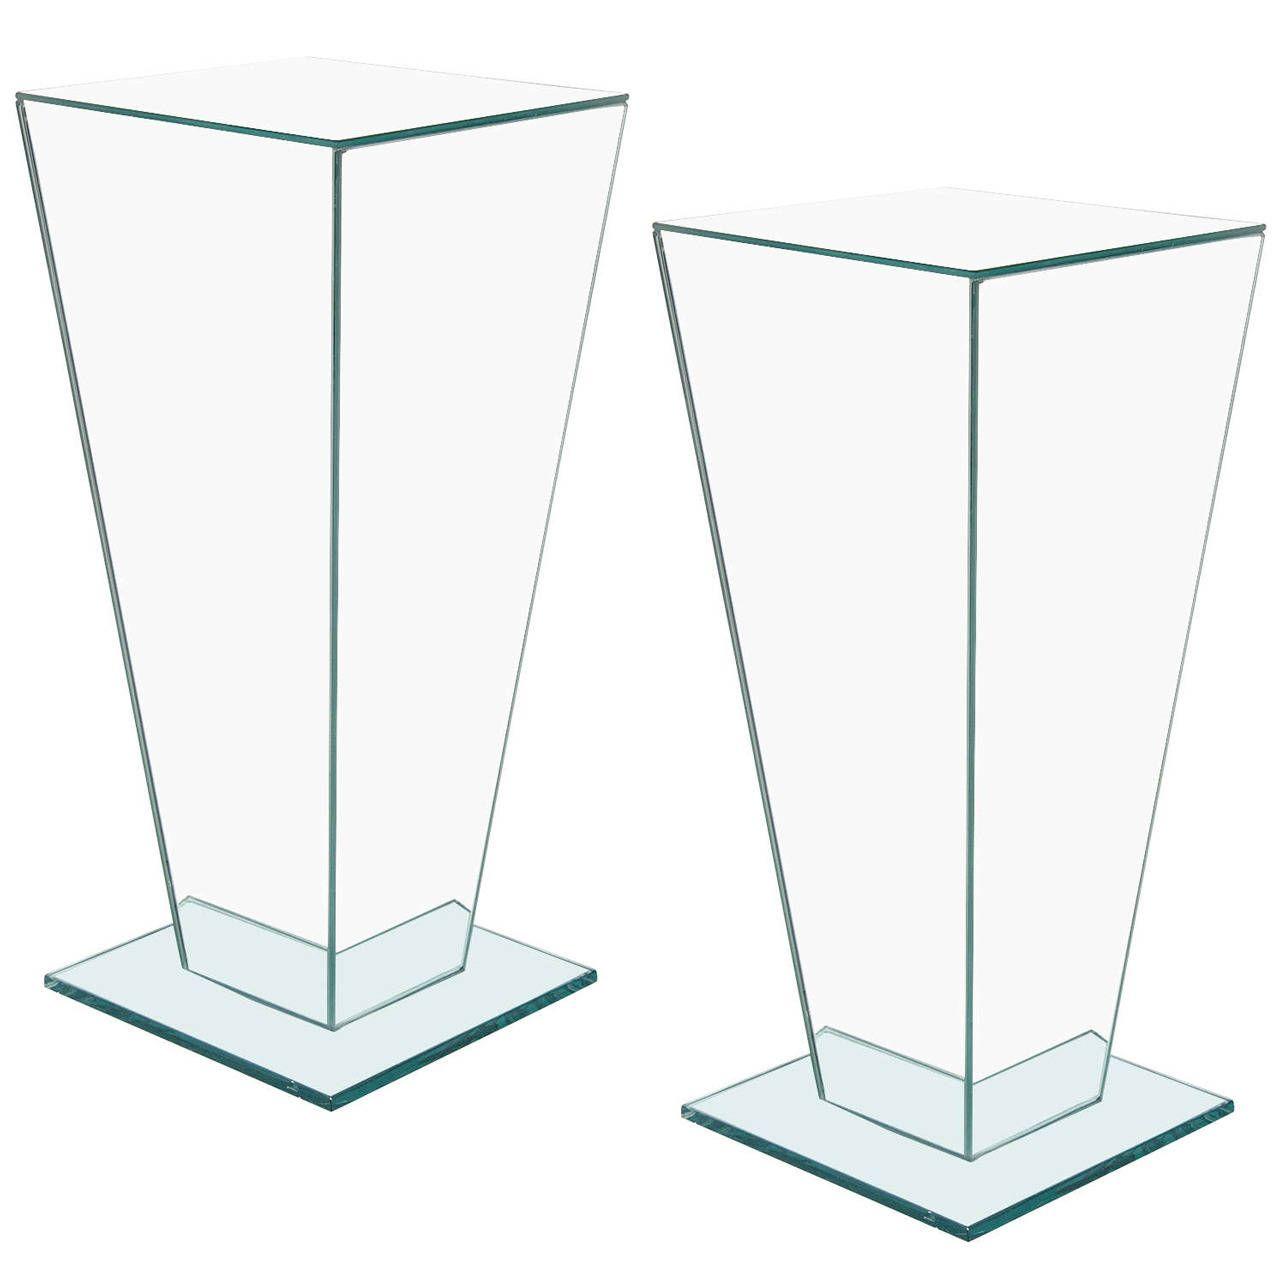 Pair of Sculptural Mid-Century Modernist Mirror and Glass Pedestals | From a unique collection of antique and modern pedestals and columns at https://www.1stdibs.com/furniture/building-garden/pedestals-columns/